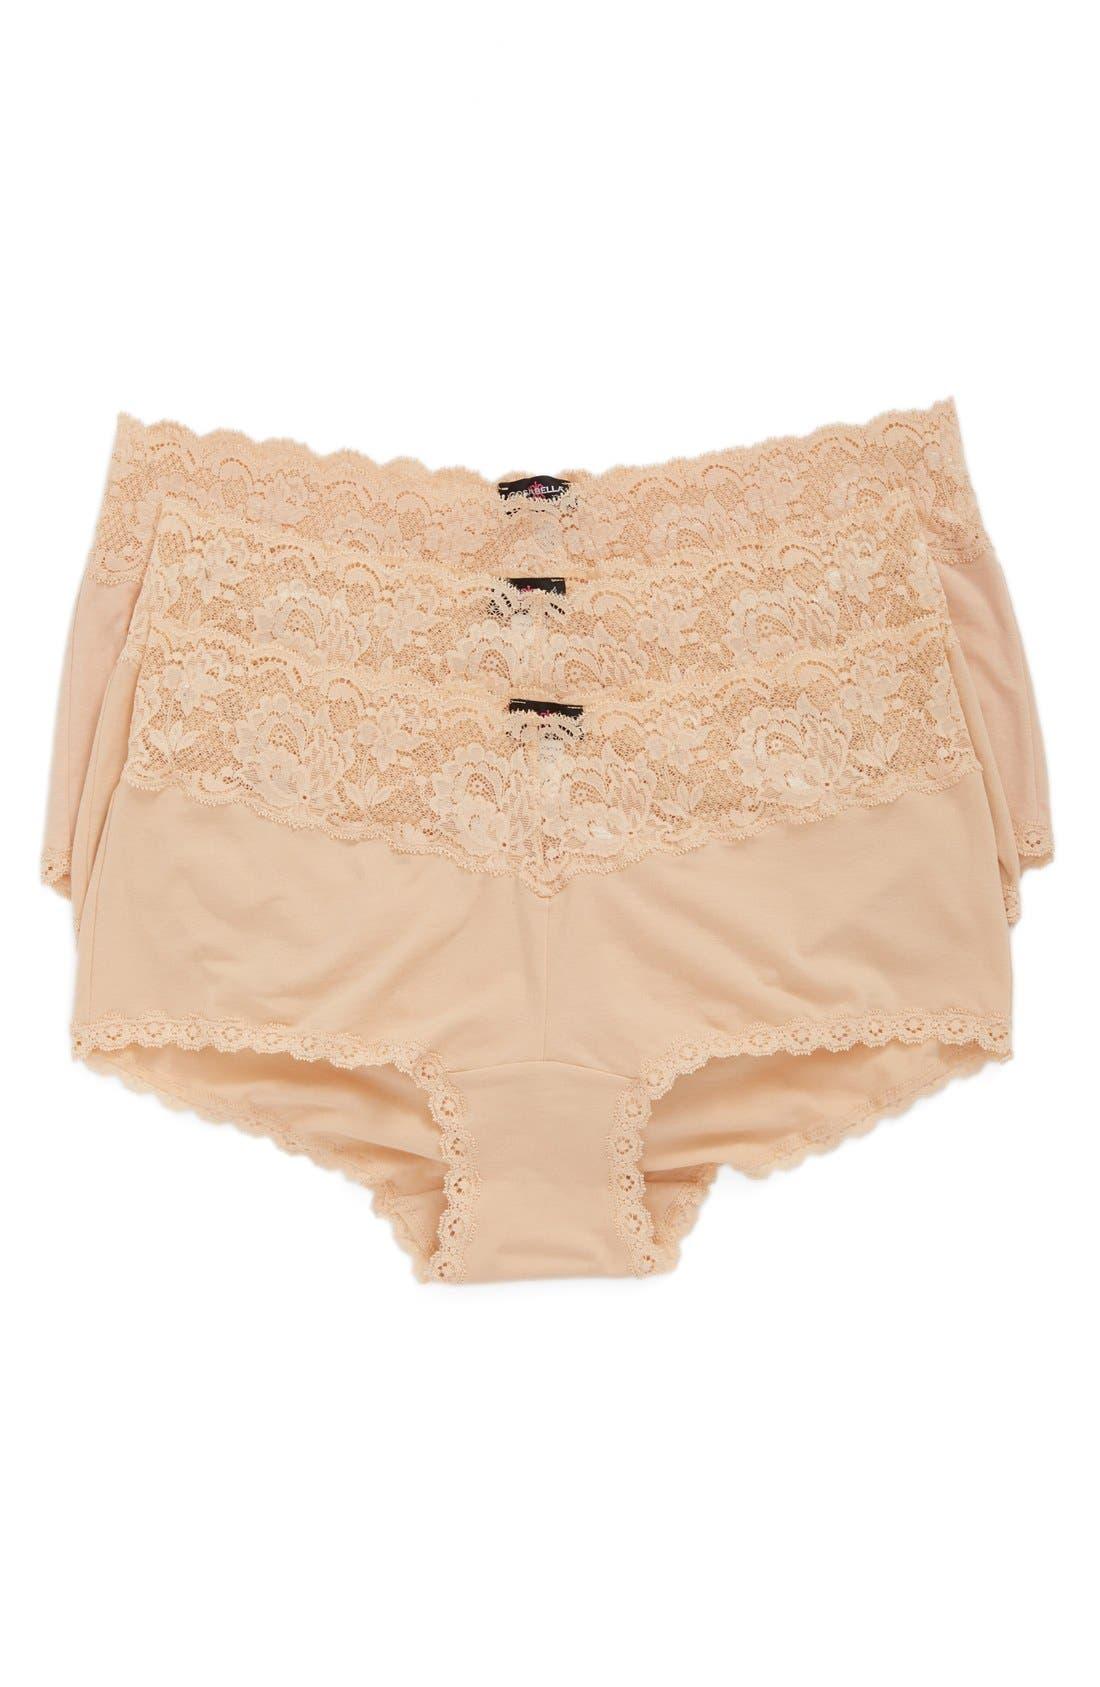 Main Image - Cosabella 'Cheekie' Lace Trim Briefs (Plus Size) (3-Pack) (Online Only)